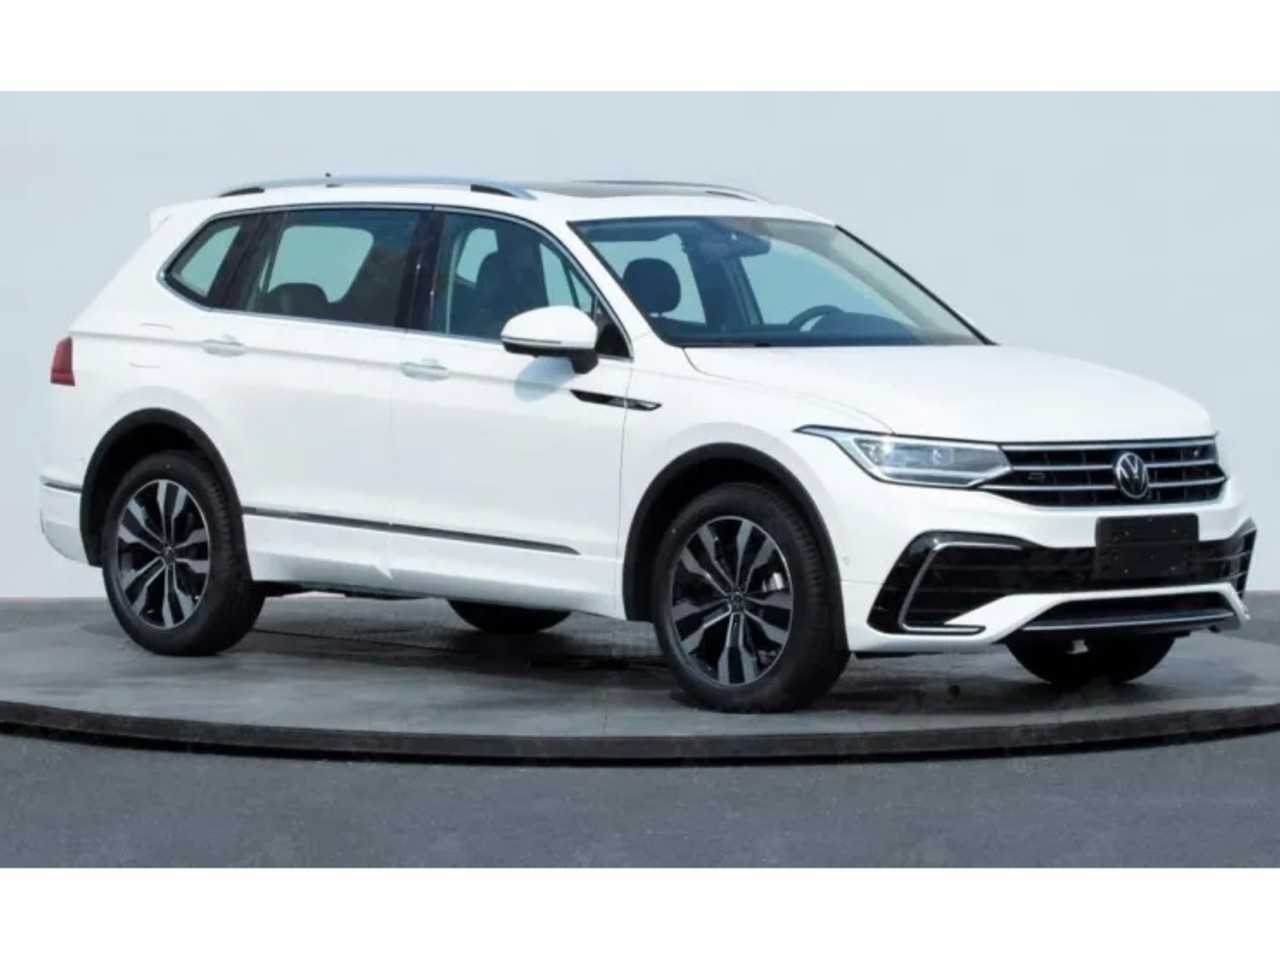 Foto mostra registro do novo Volkswagen Tiguan Allspace na China